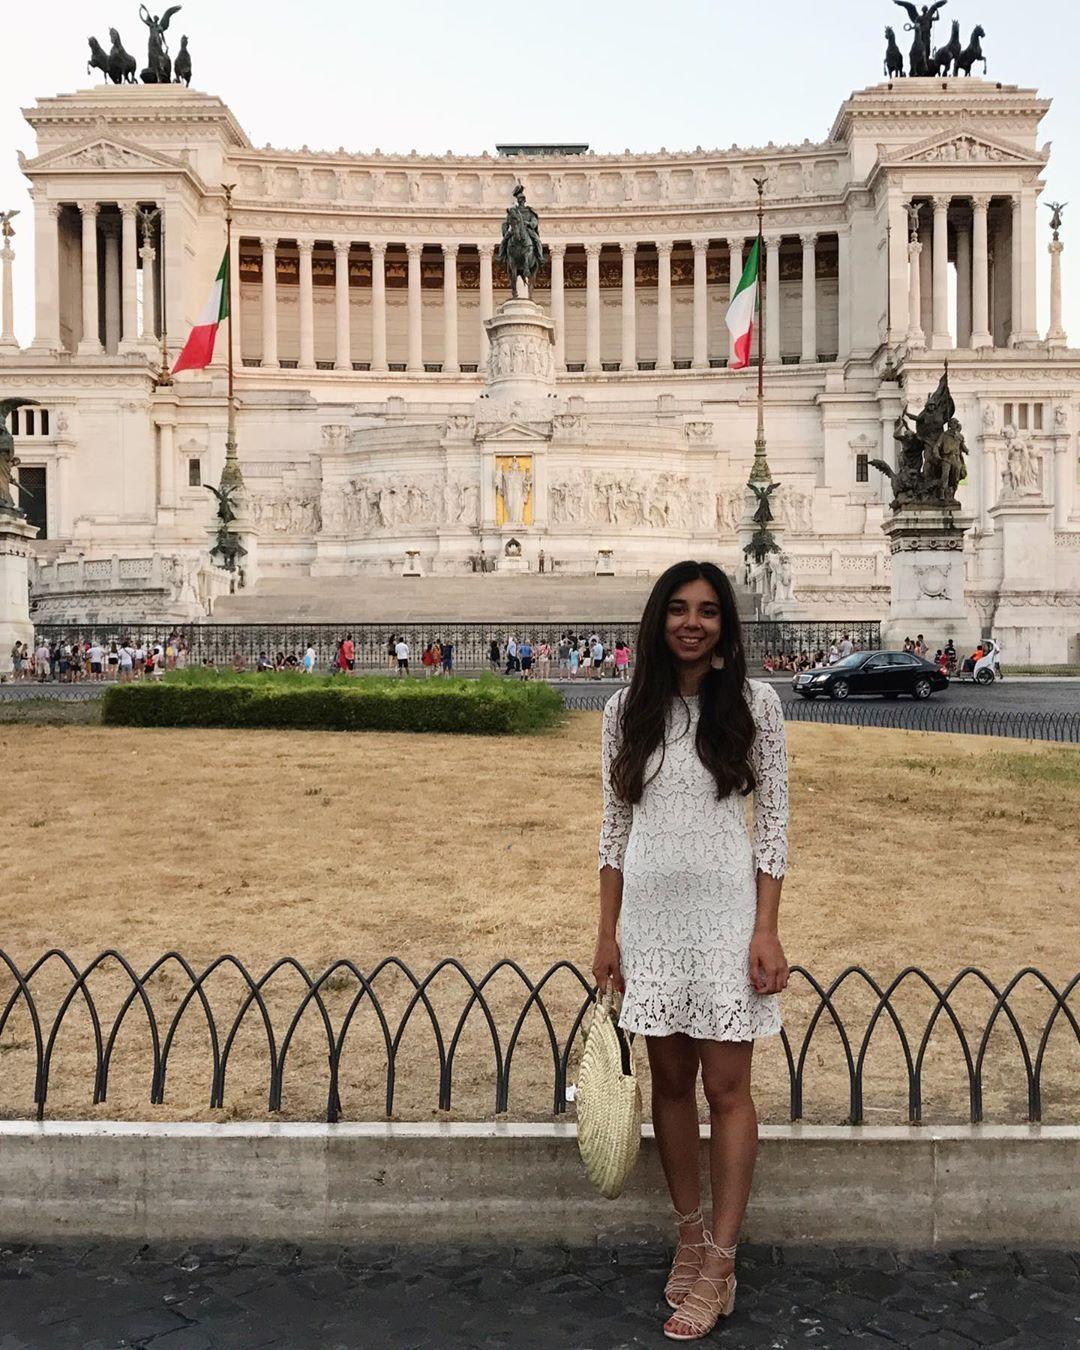 rome w/ the perfect tan  #rome #throwback #roma #italy #visititaly #travel #travelitaly #traveladdict #travel_drops #tra...